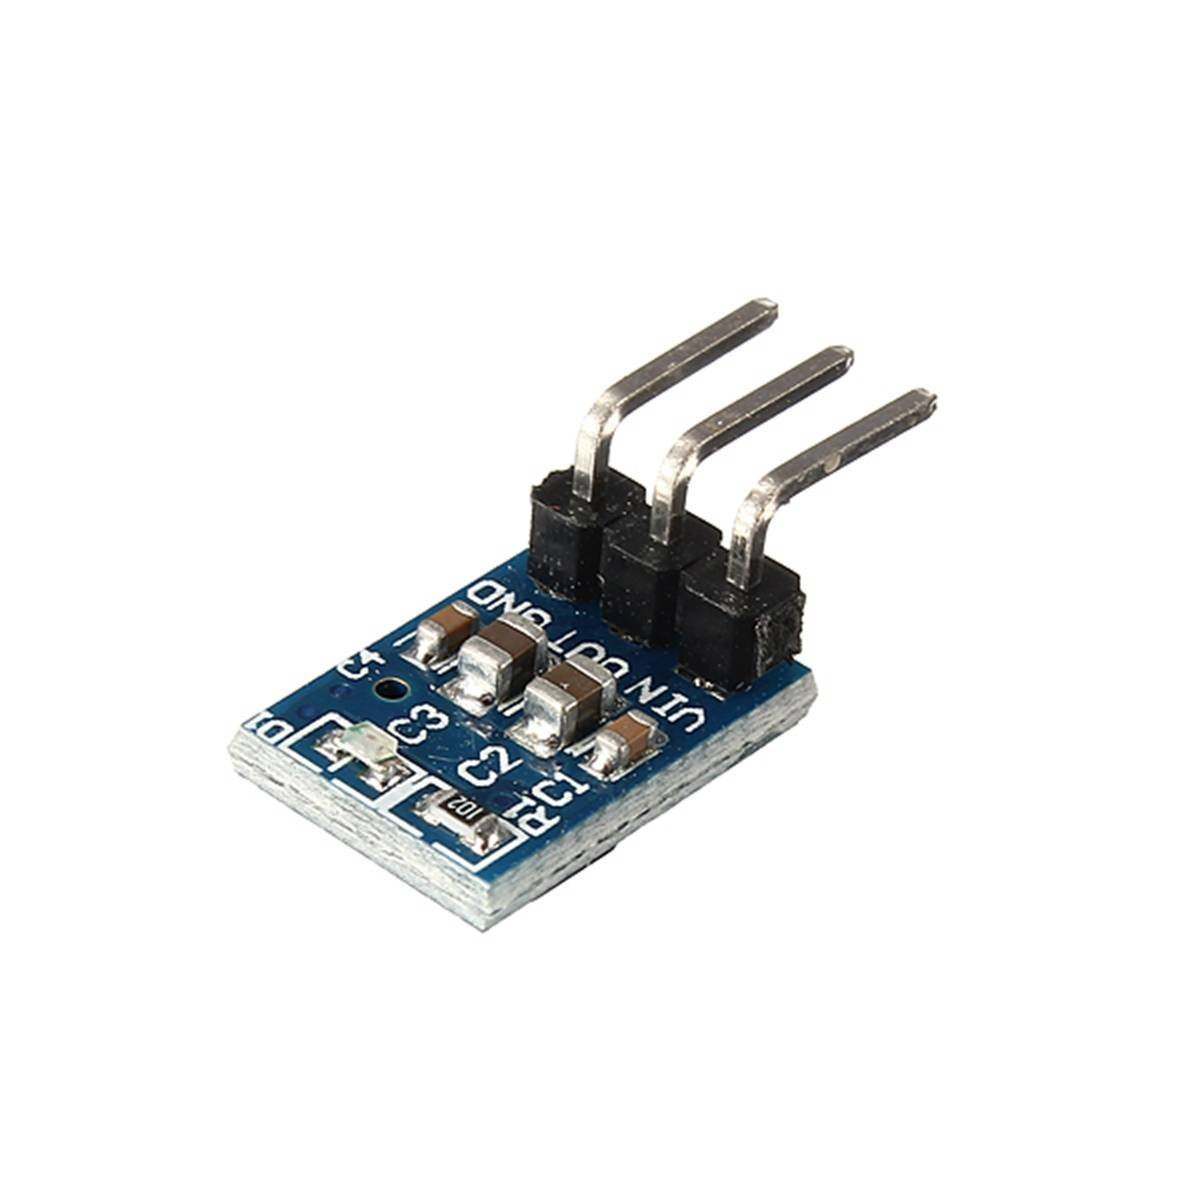 5Pcs DC 5V to 3.3V DC-DC Step-Down Power Supply Buck Module AMS1117 LDO 800MA daier null